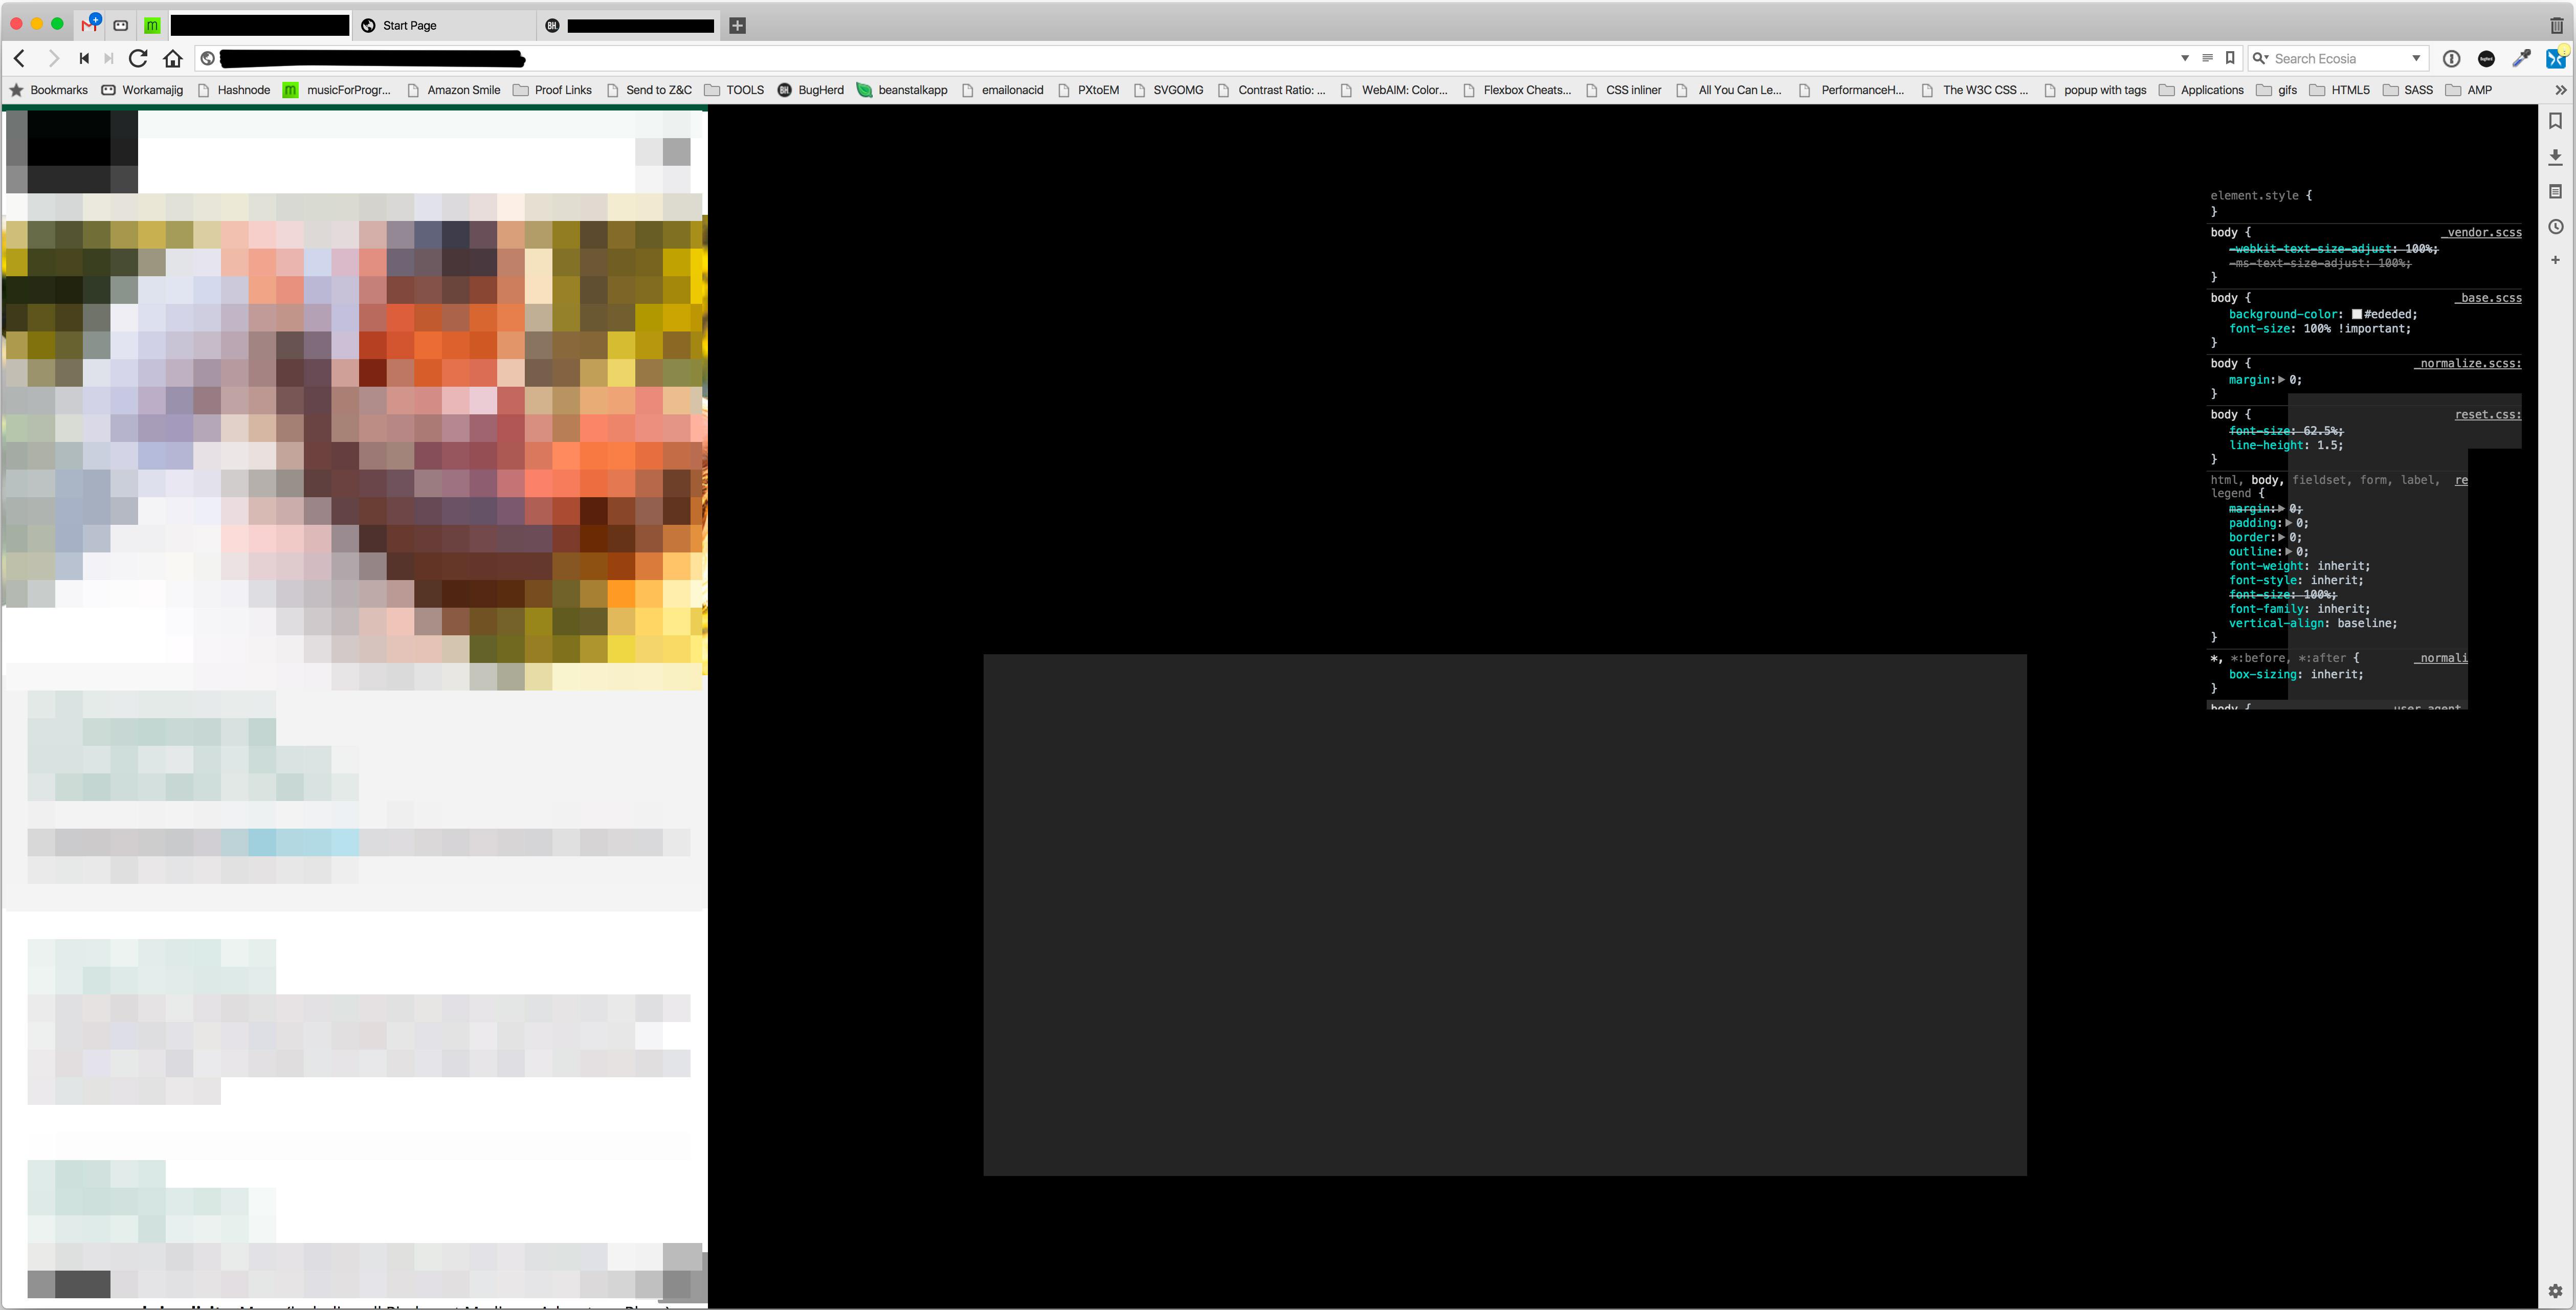 Vivaldi black screen